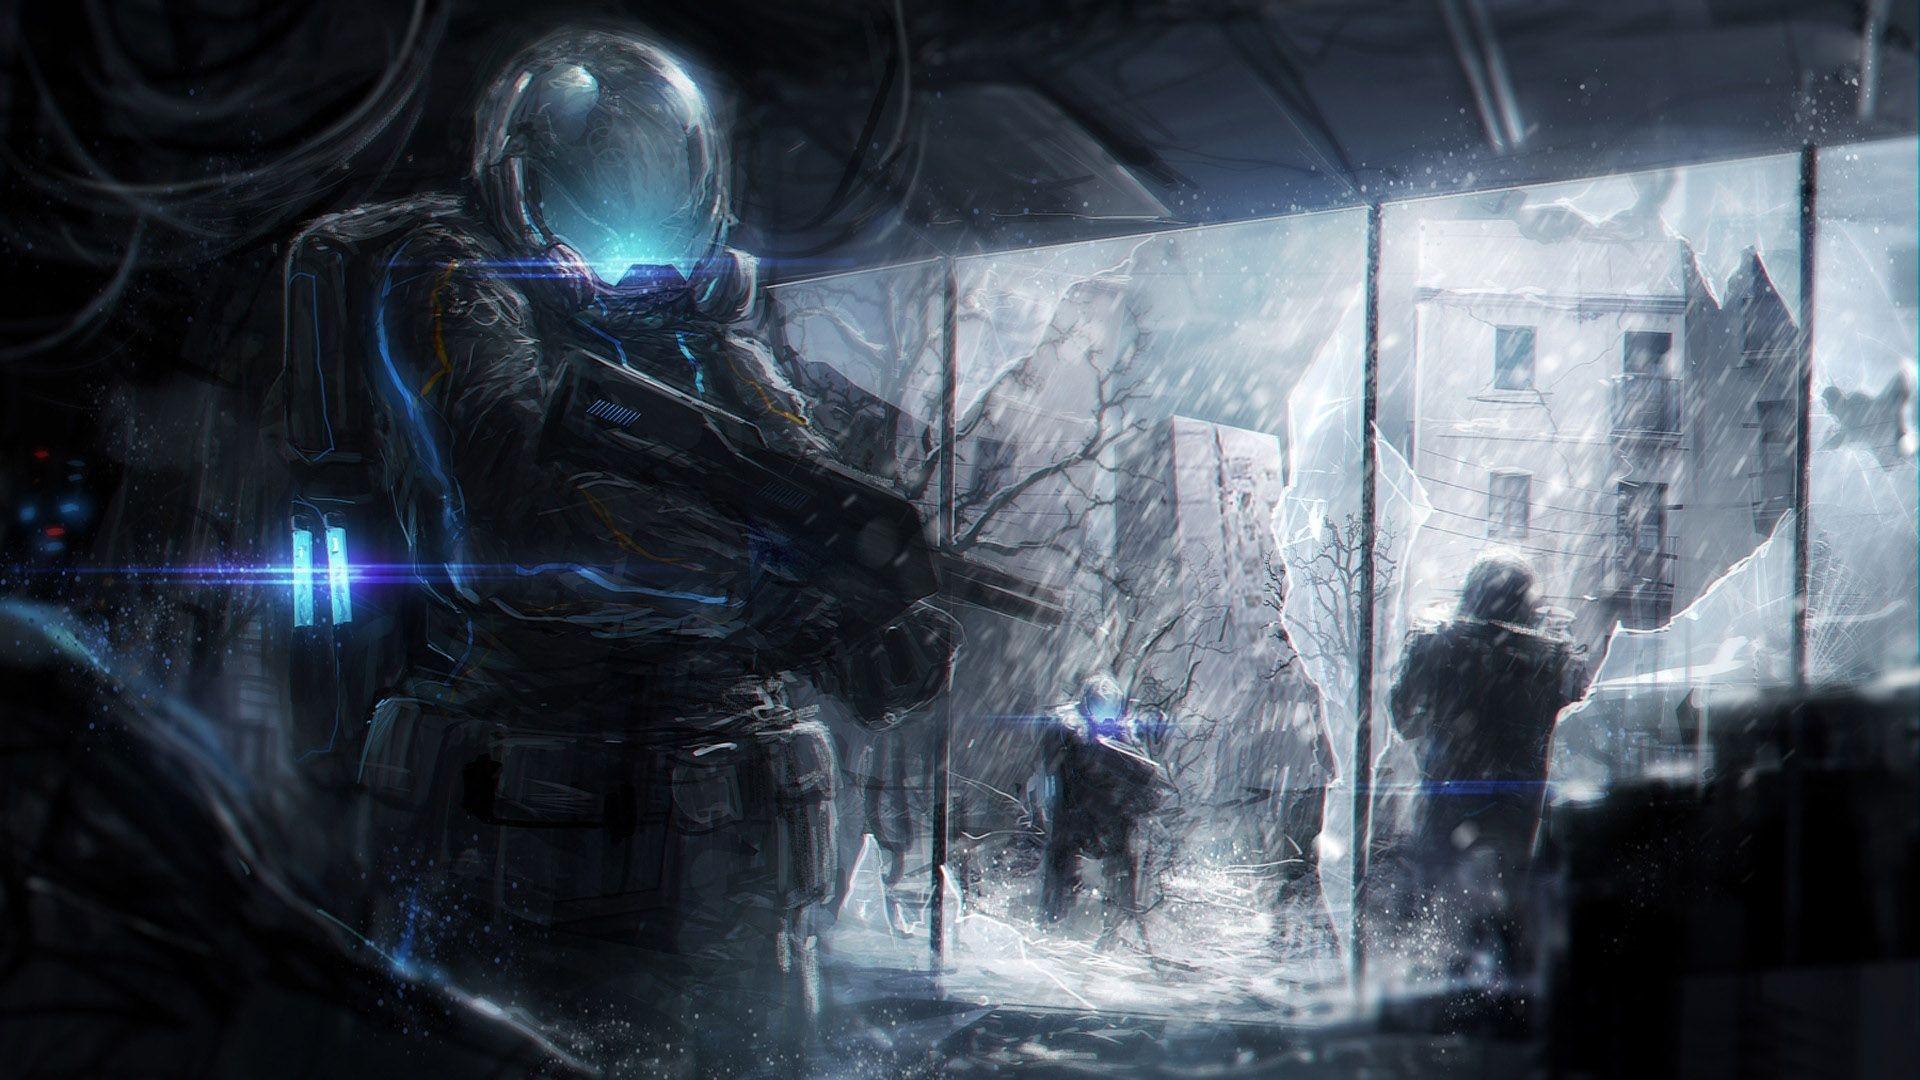 post apocalyptic war full hd fond d'écran and arrière-plan